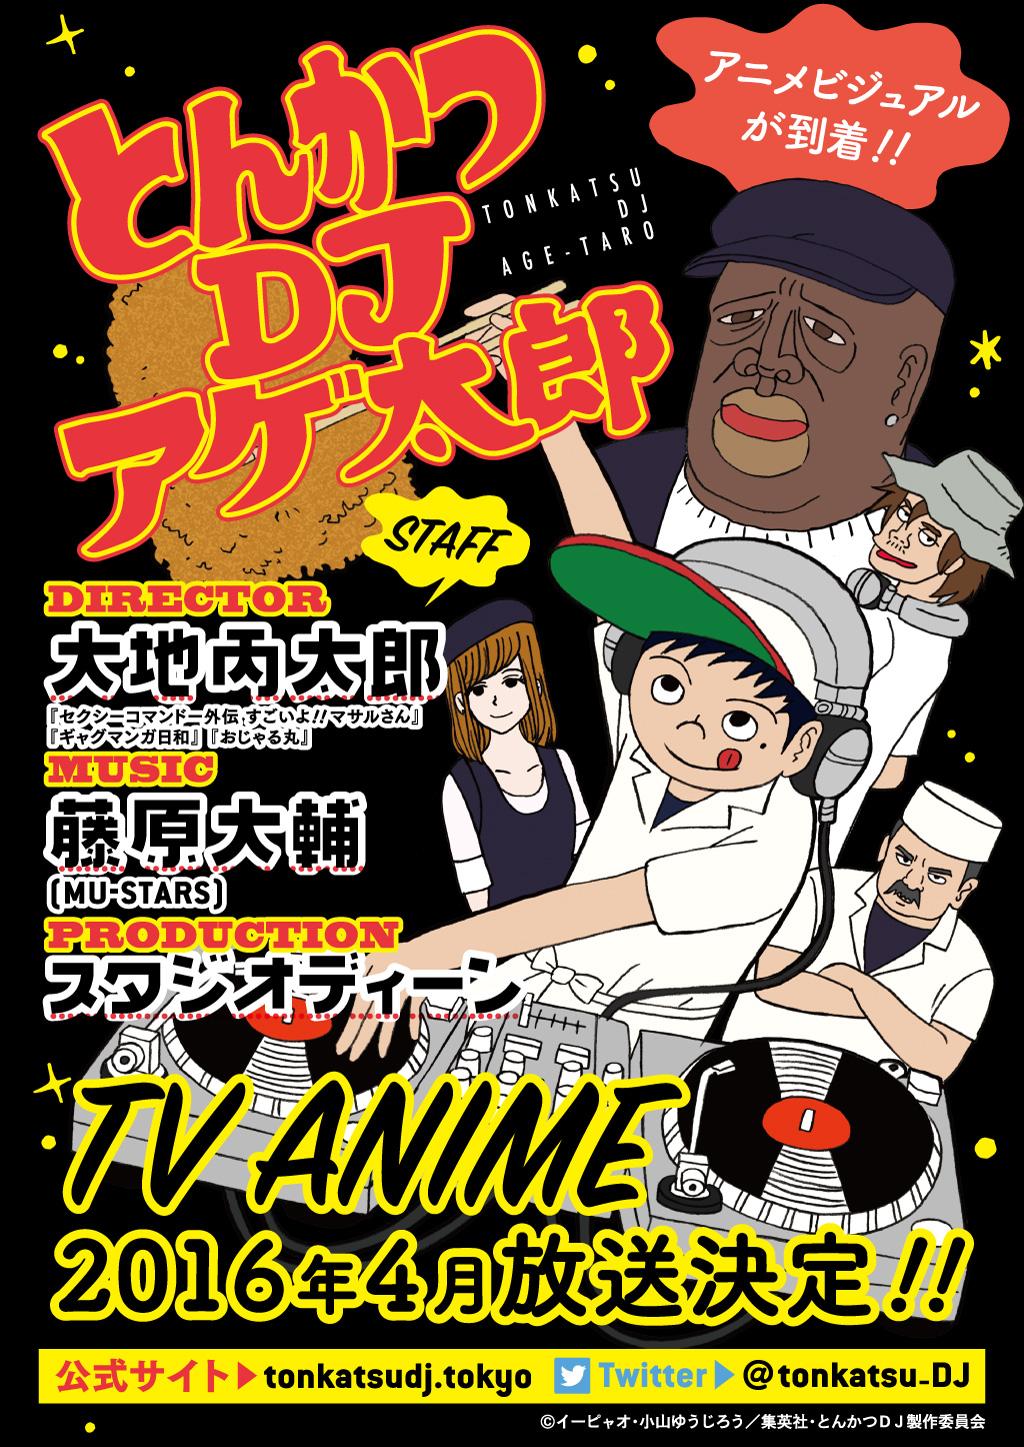 Tonkatsu DJ Agetarou TV Anime Cast Announced